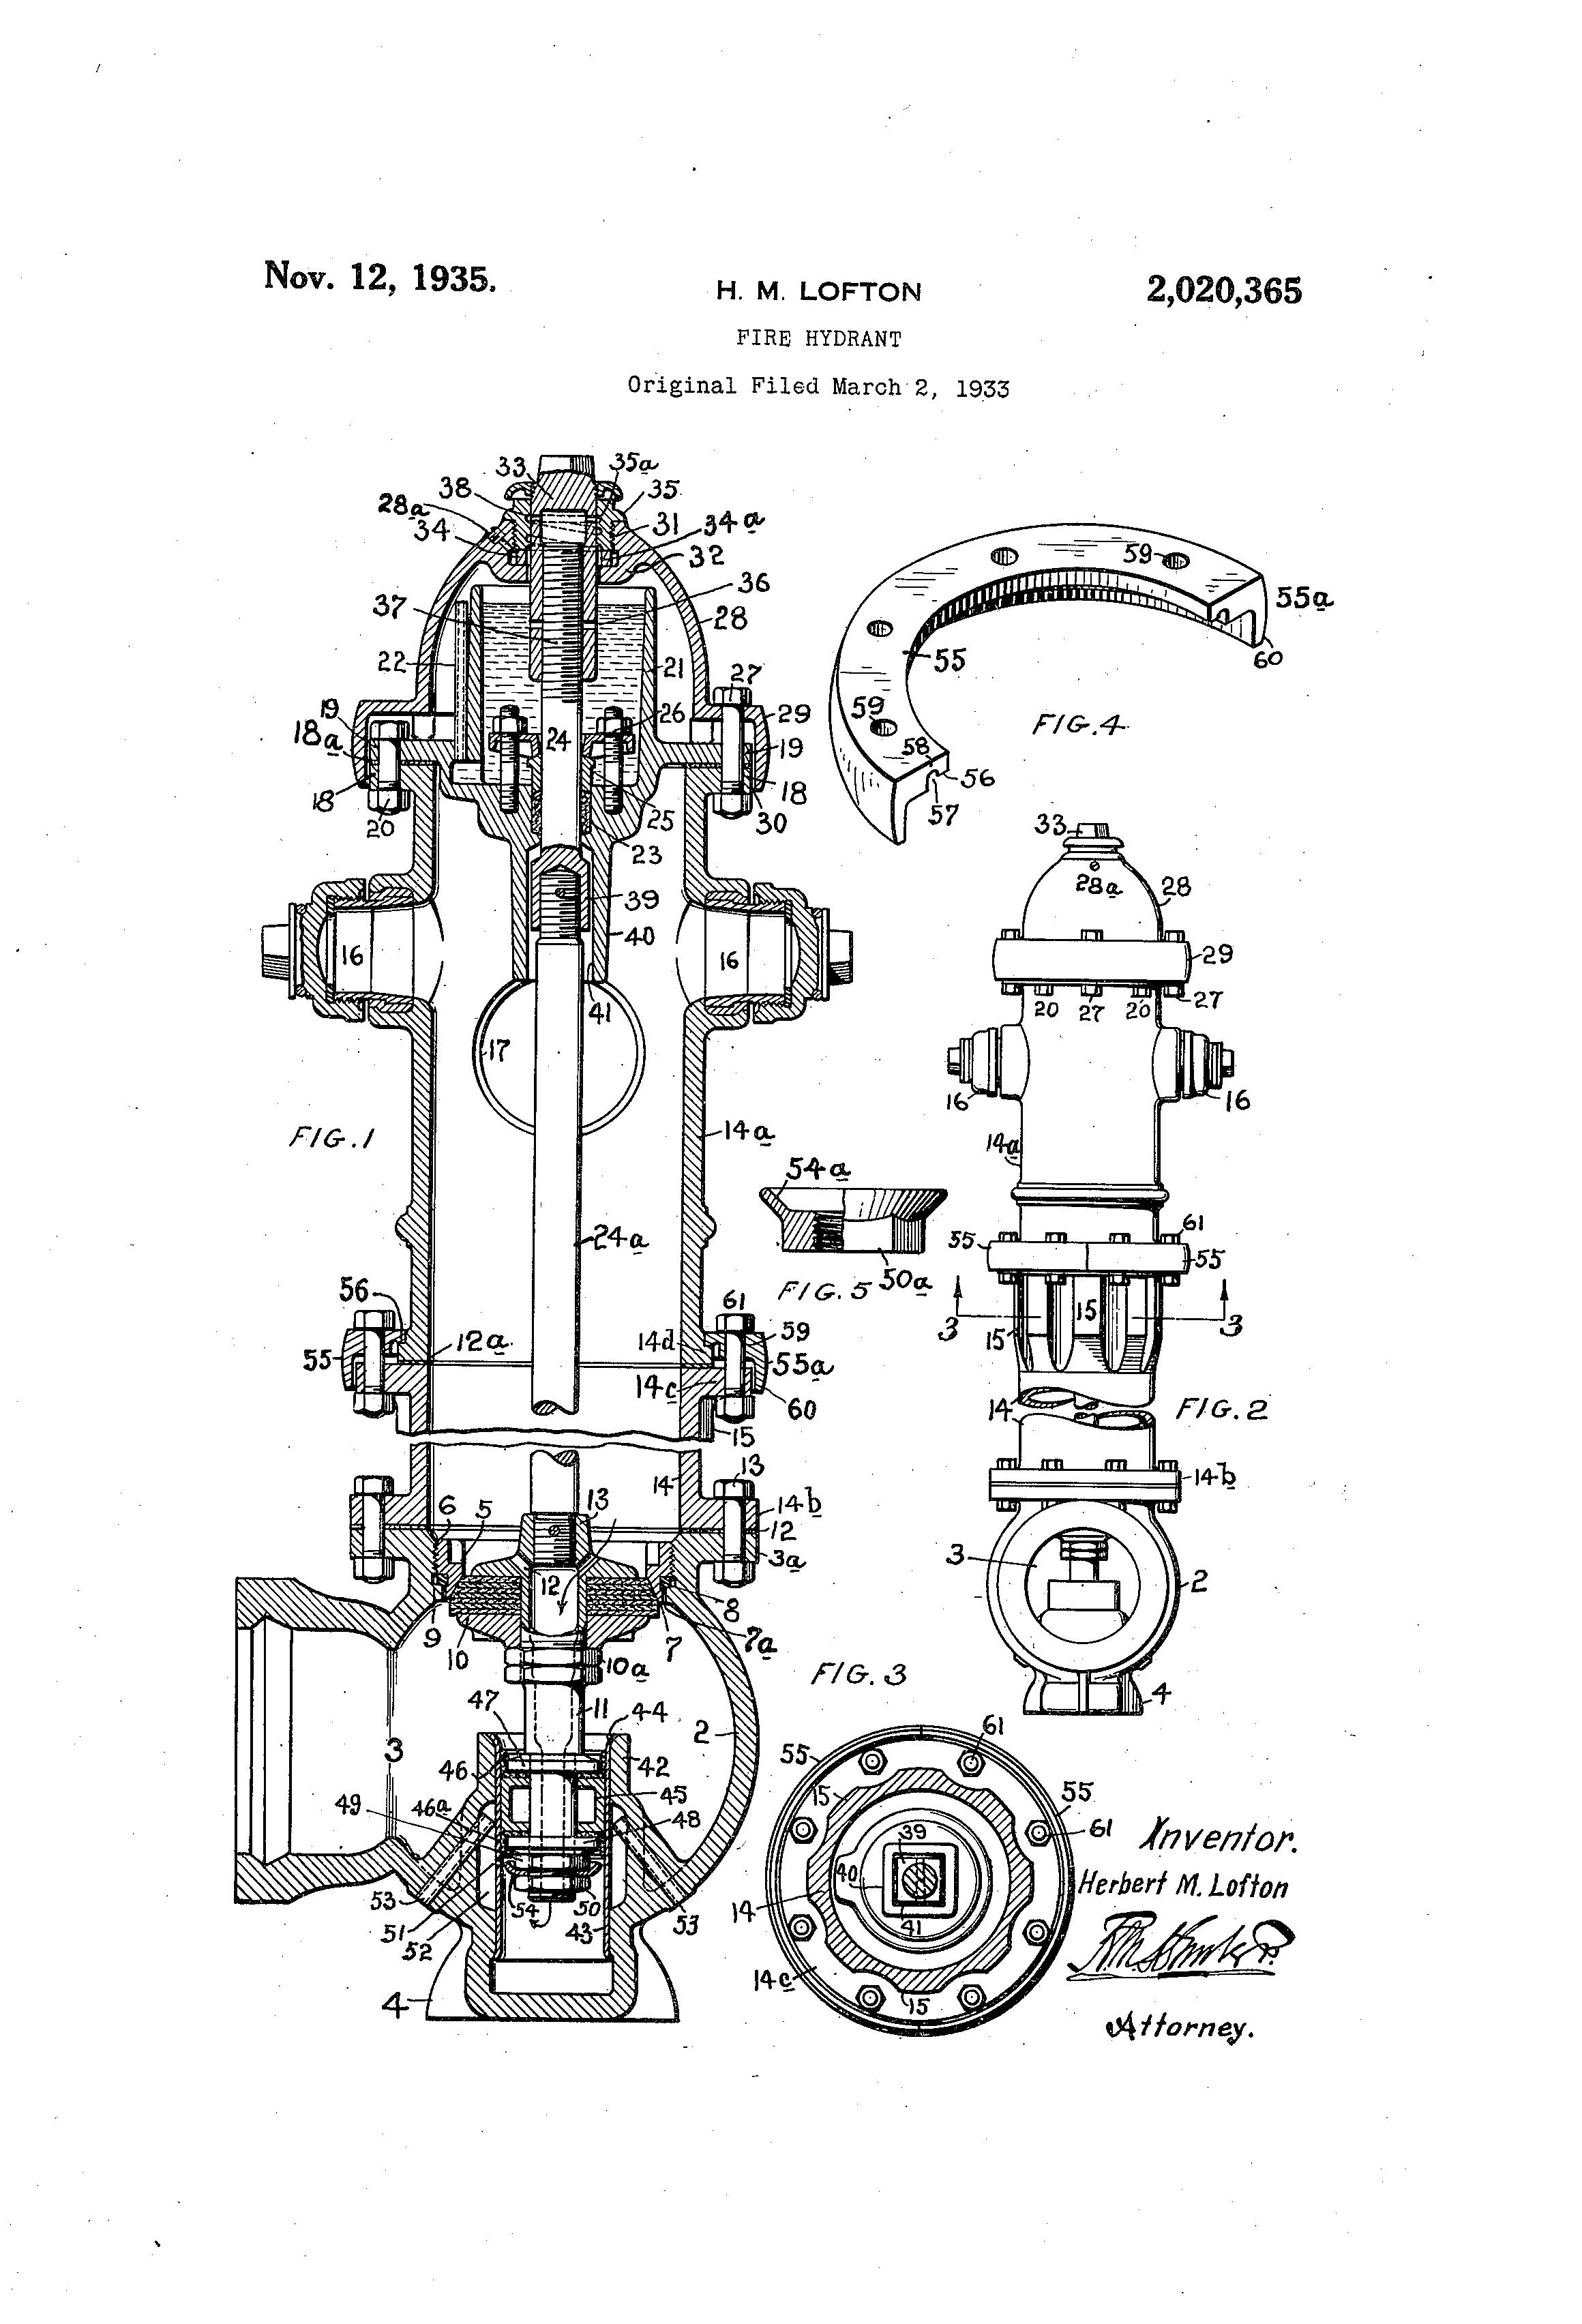 33 Fire Hydrant Parts Diagram